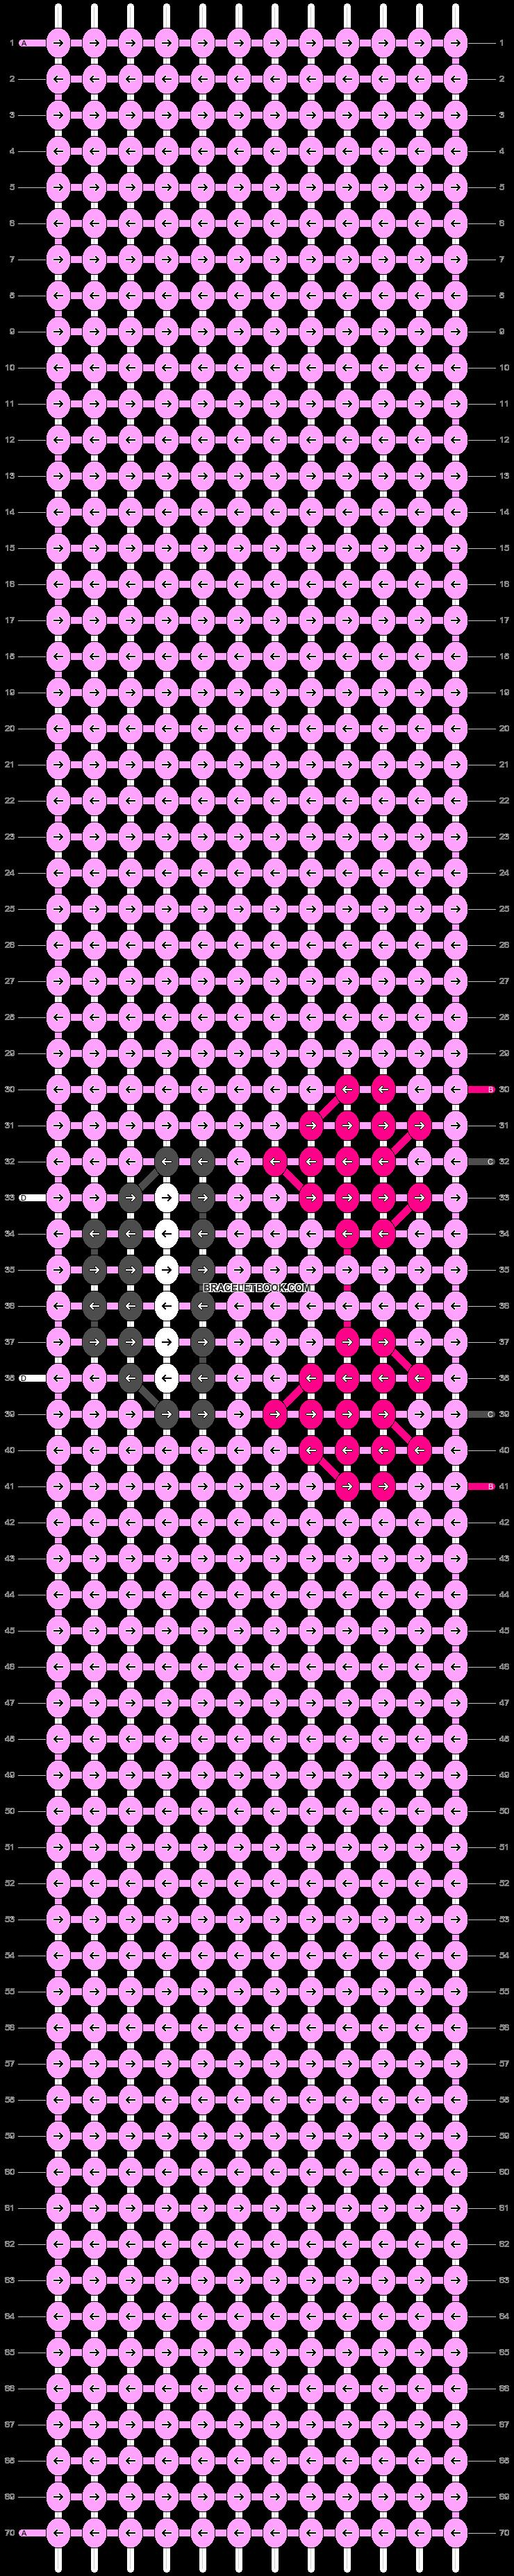 Alpha pattern #93867 pattern